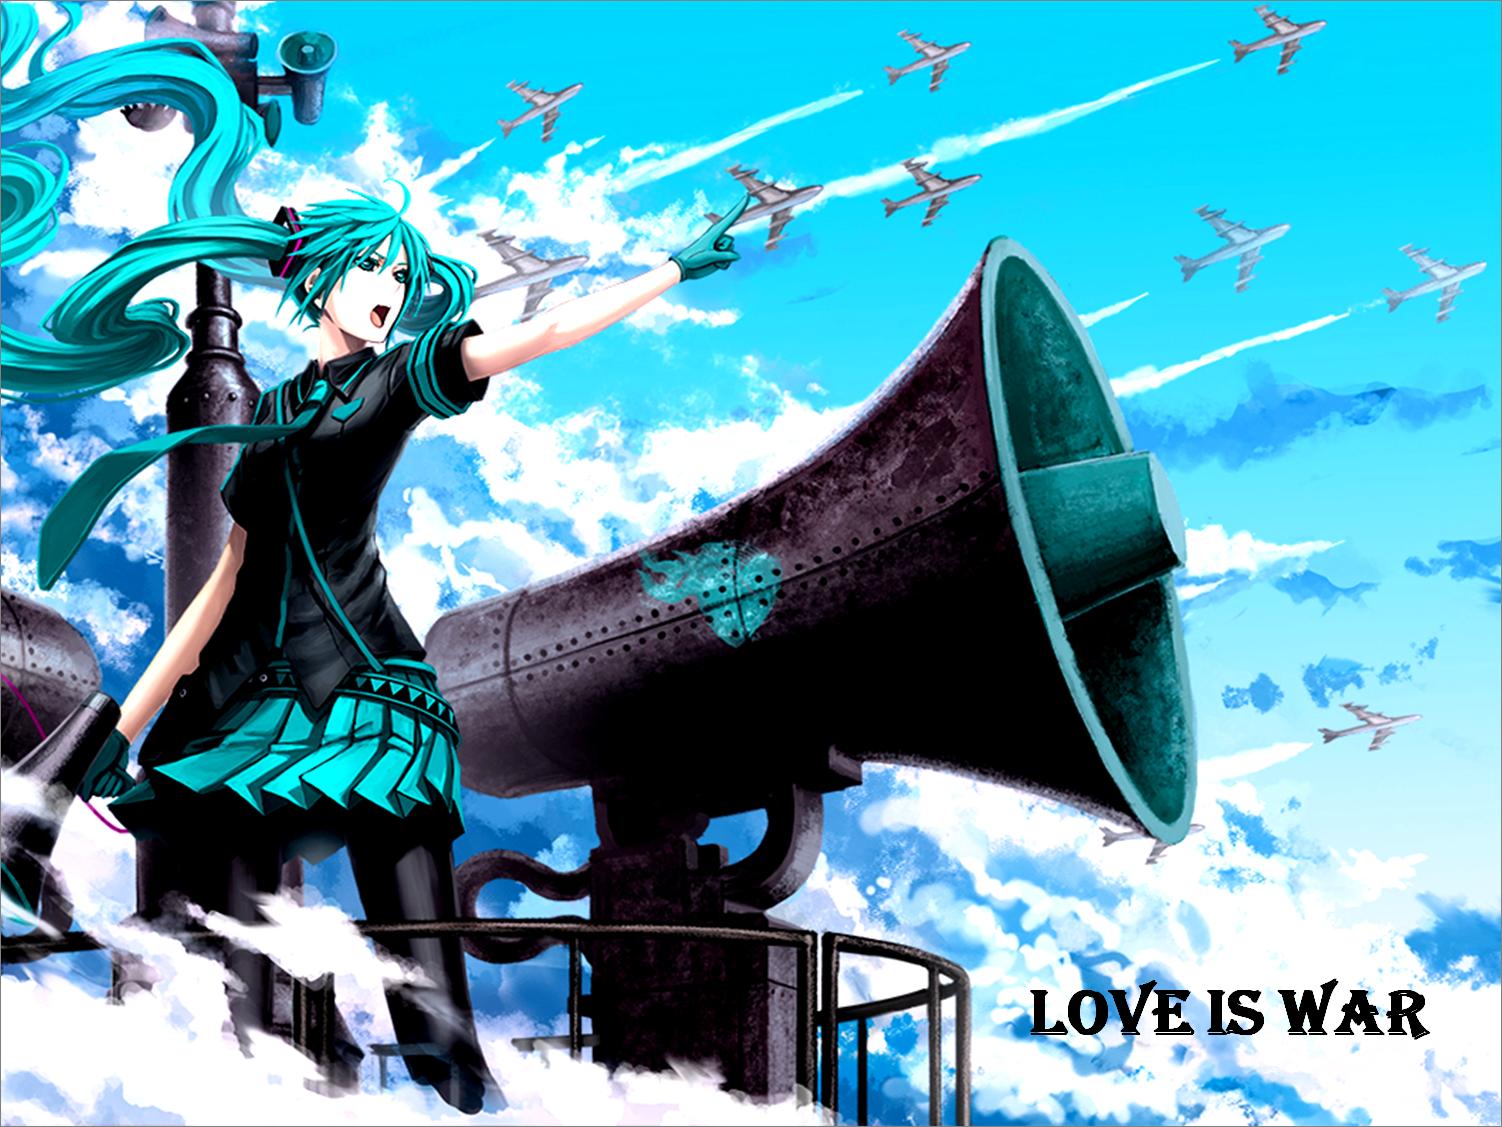 Hatsune Miku Love Is War Hatsune Miku Wallpaper 37551848